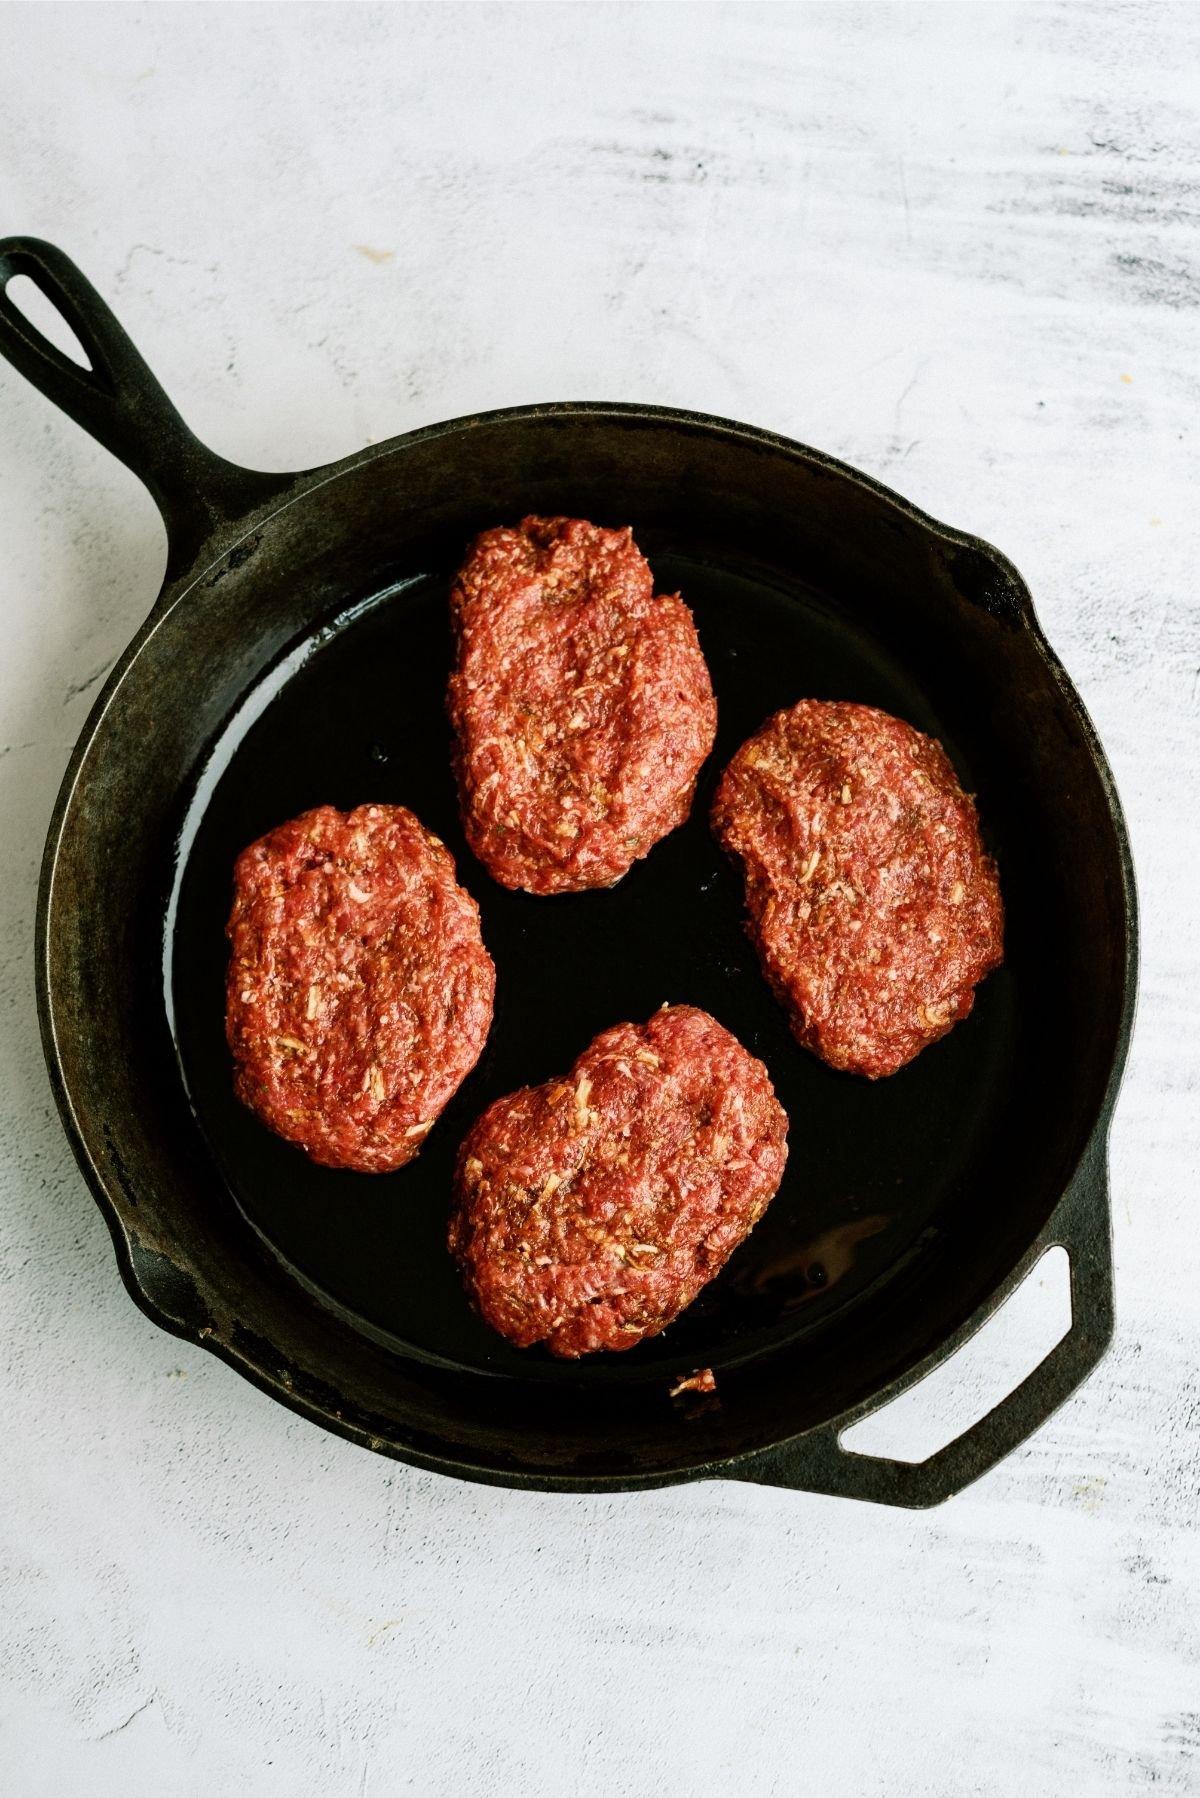 Skillet with 4 uncooked Salisbury Steak patties